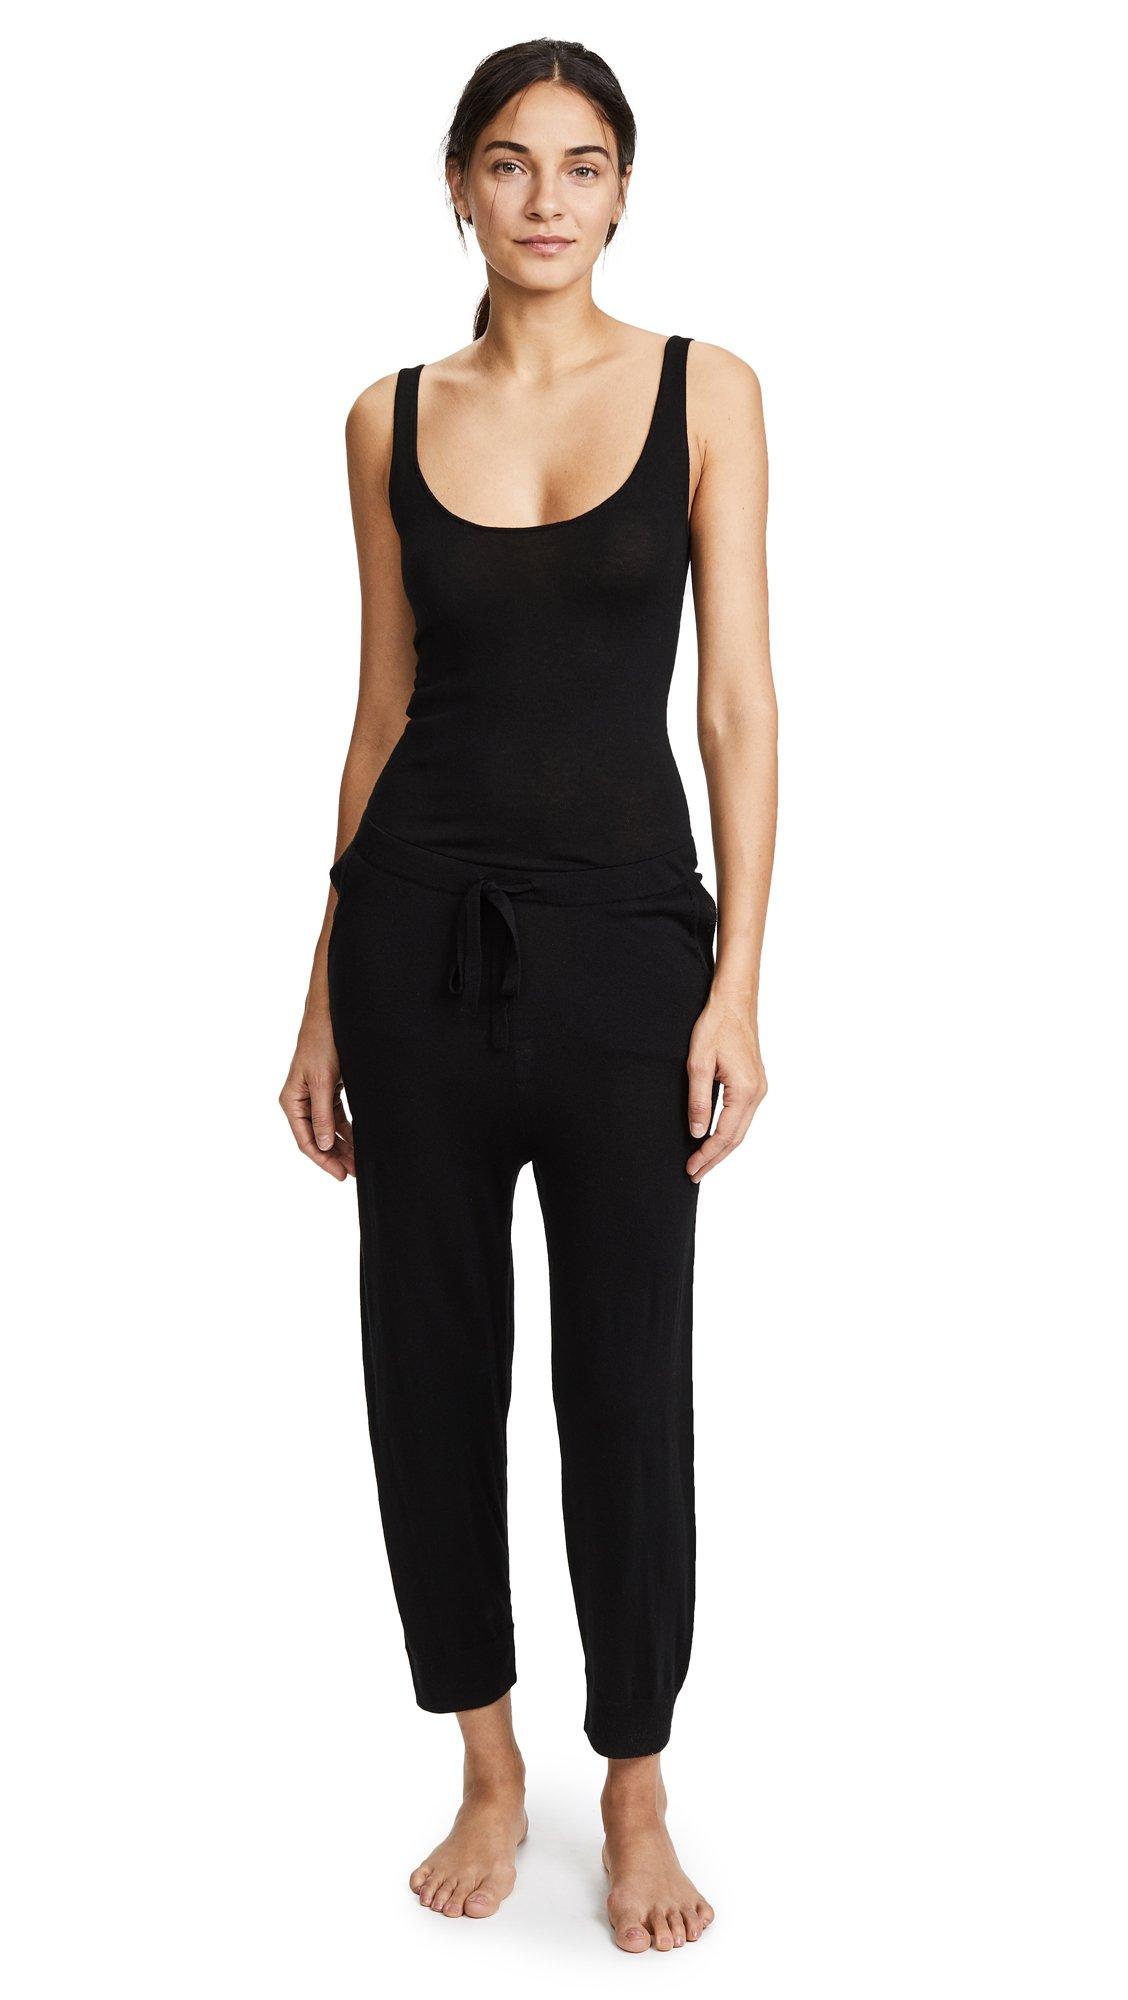 Skin Women's Monet Sleep Jumpsuit, Black, 1